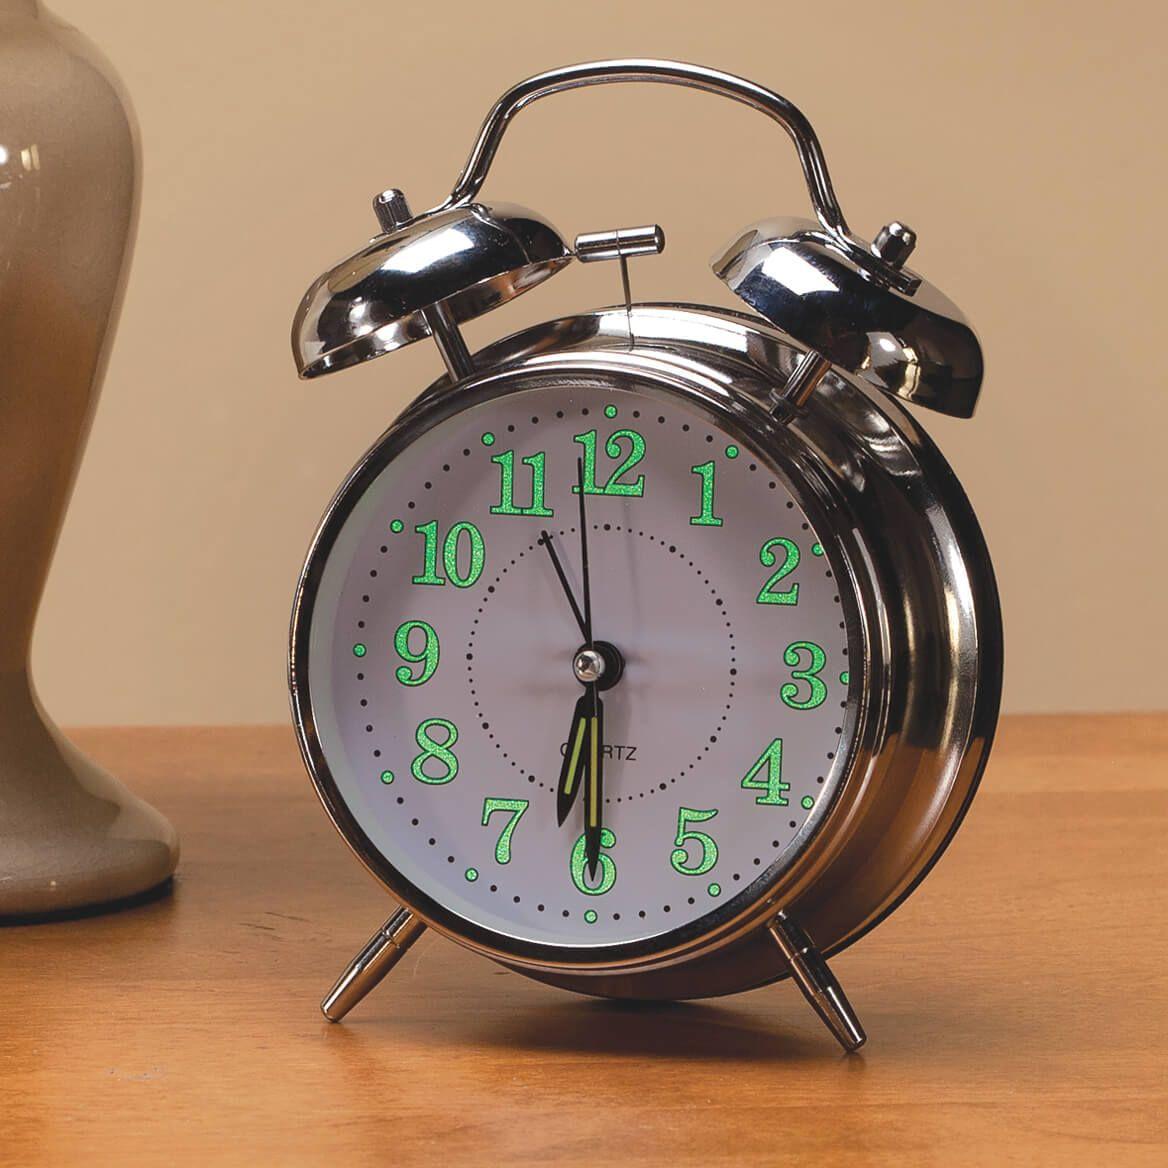 Vintage Glow in the Dark Alarm Clock-360437